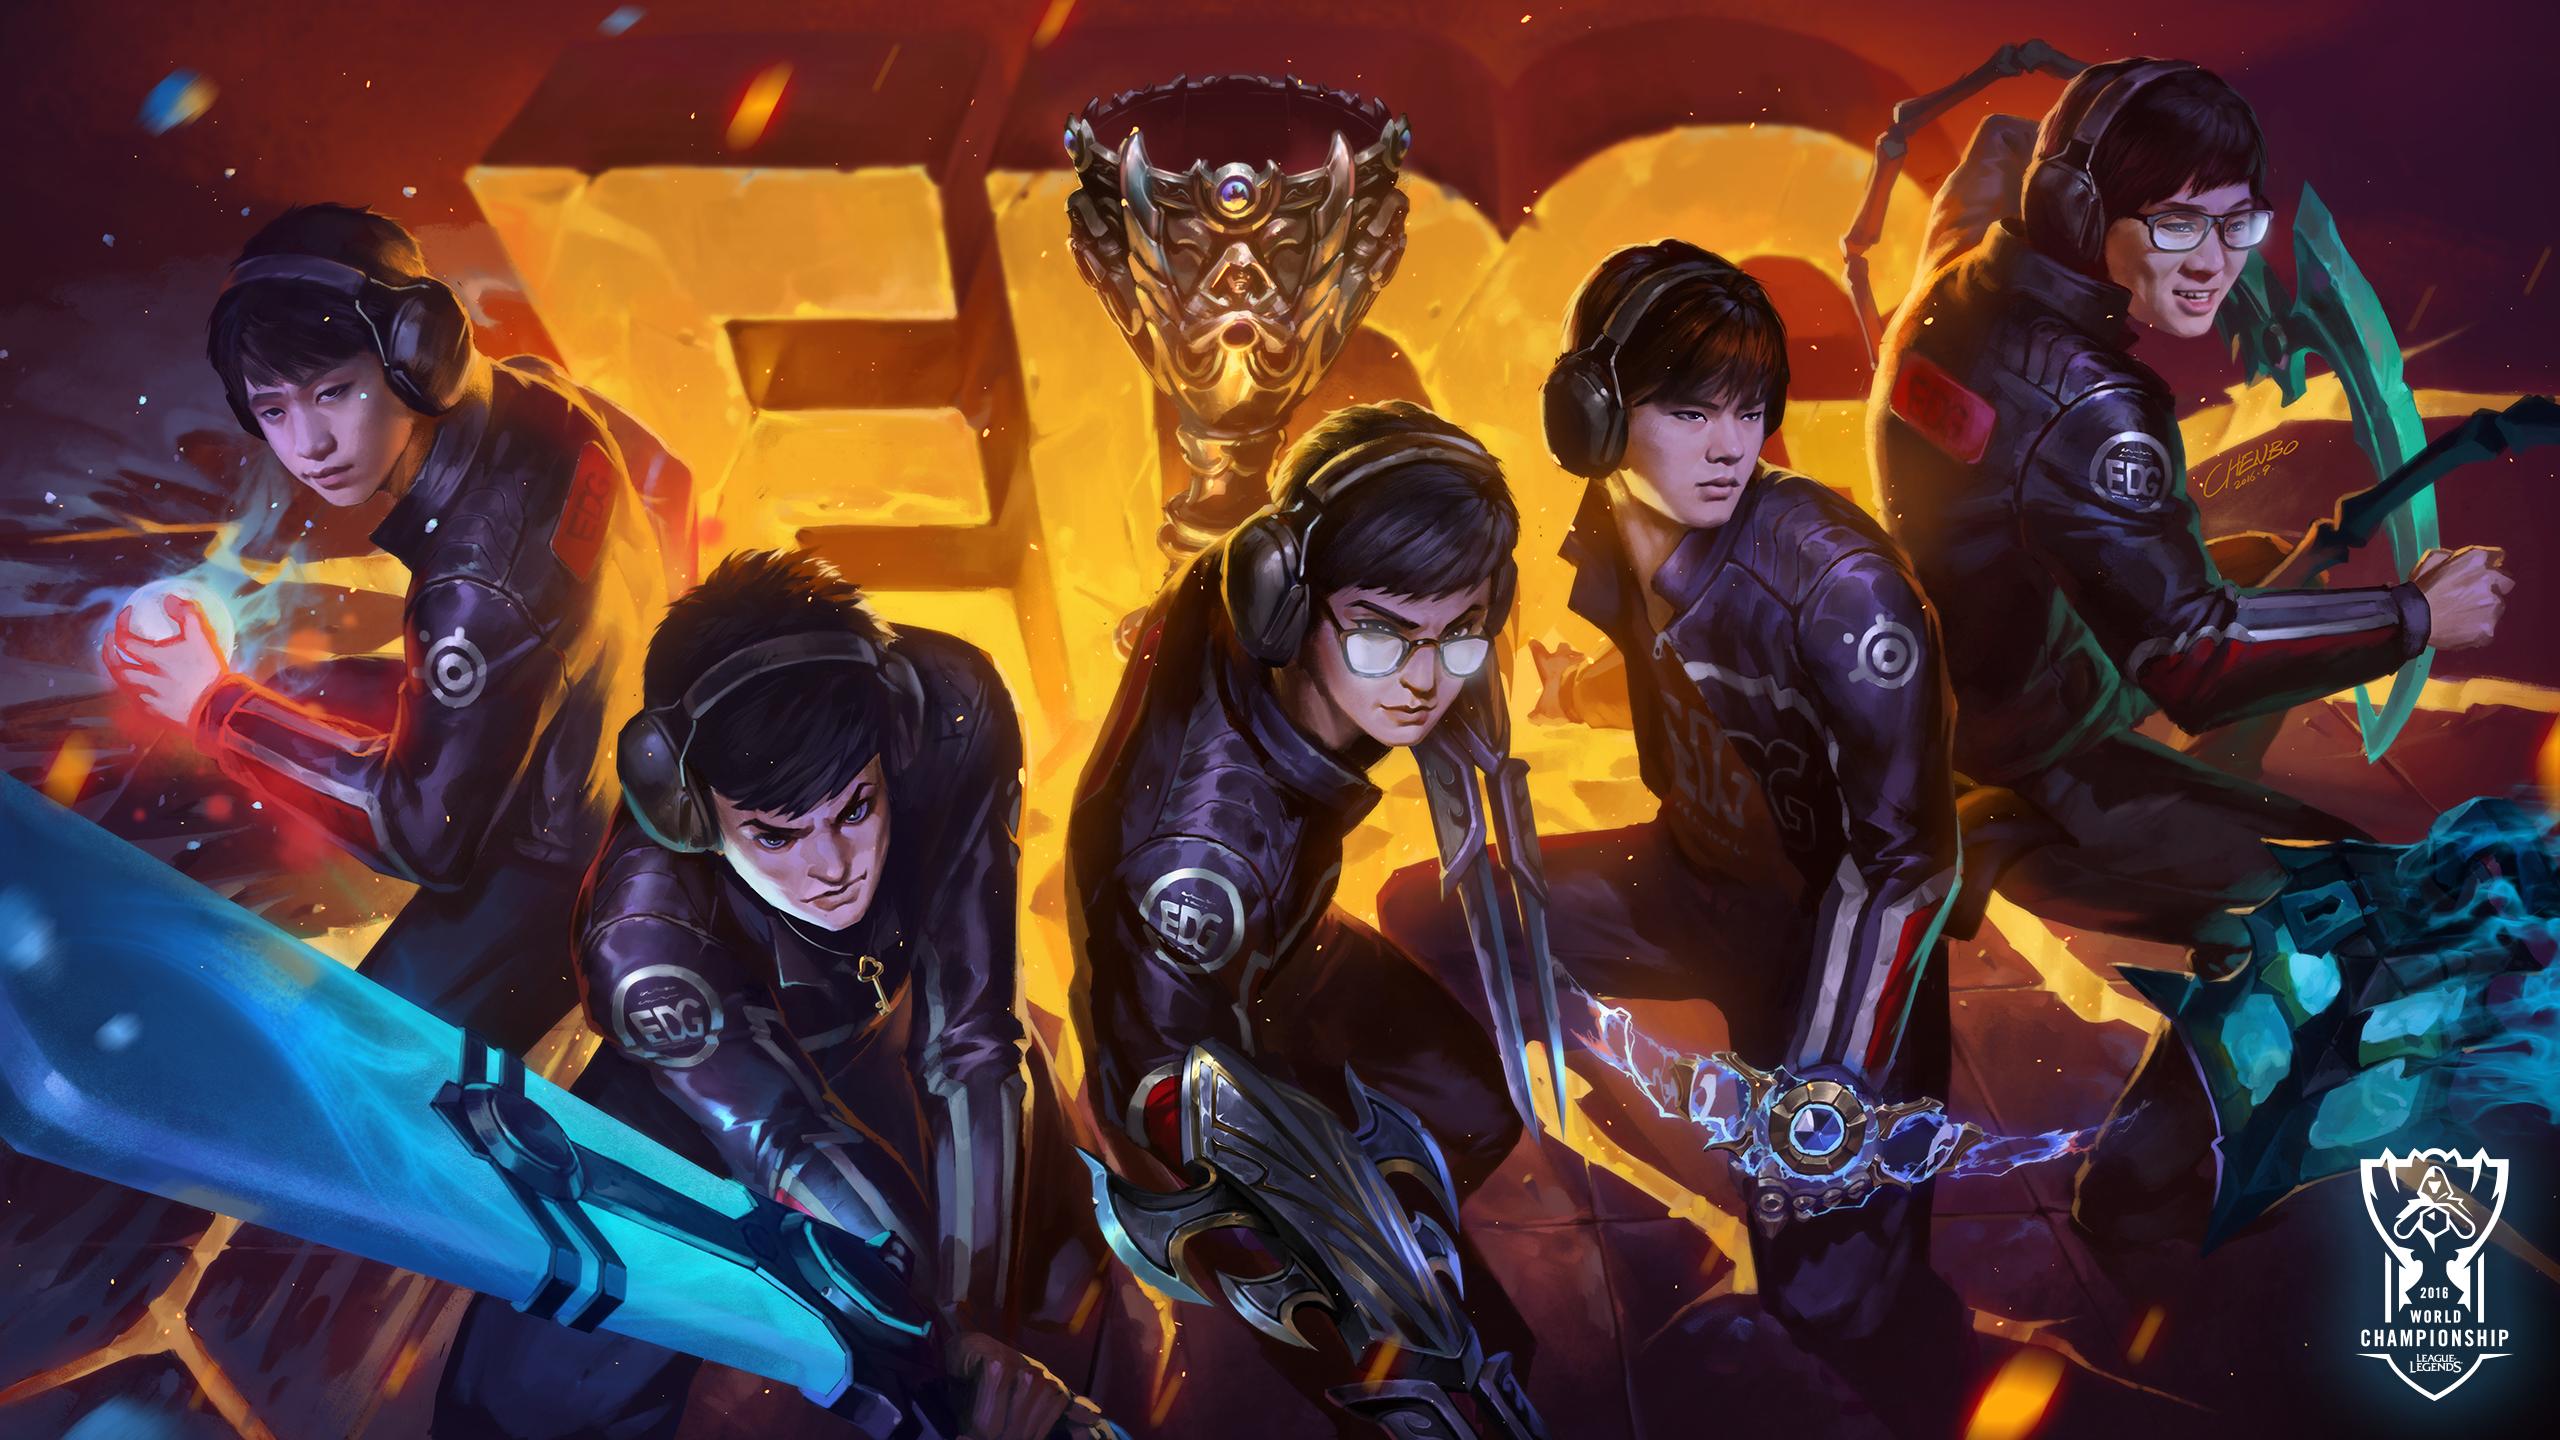 G2 League Of Legends Wallpaper Teams 2560x1440 Wallpaper Teahub Io